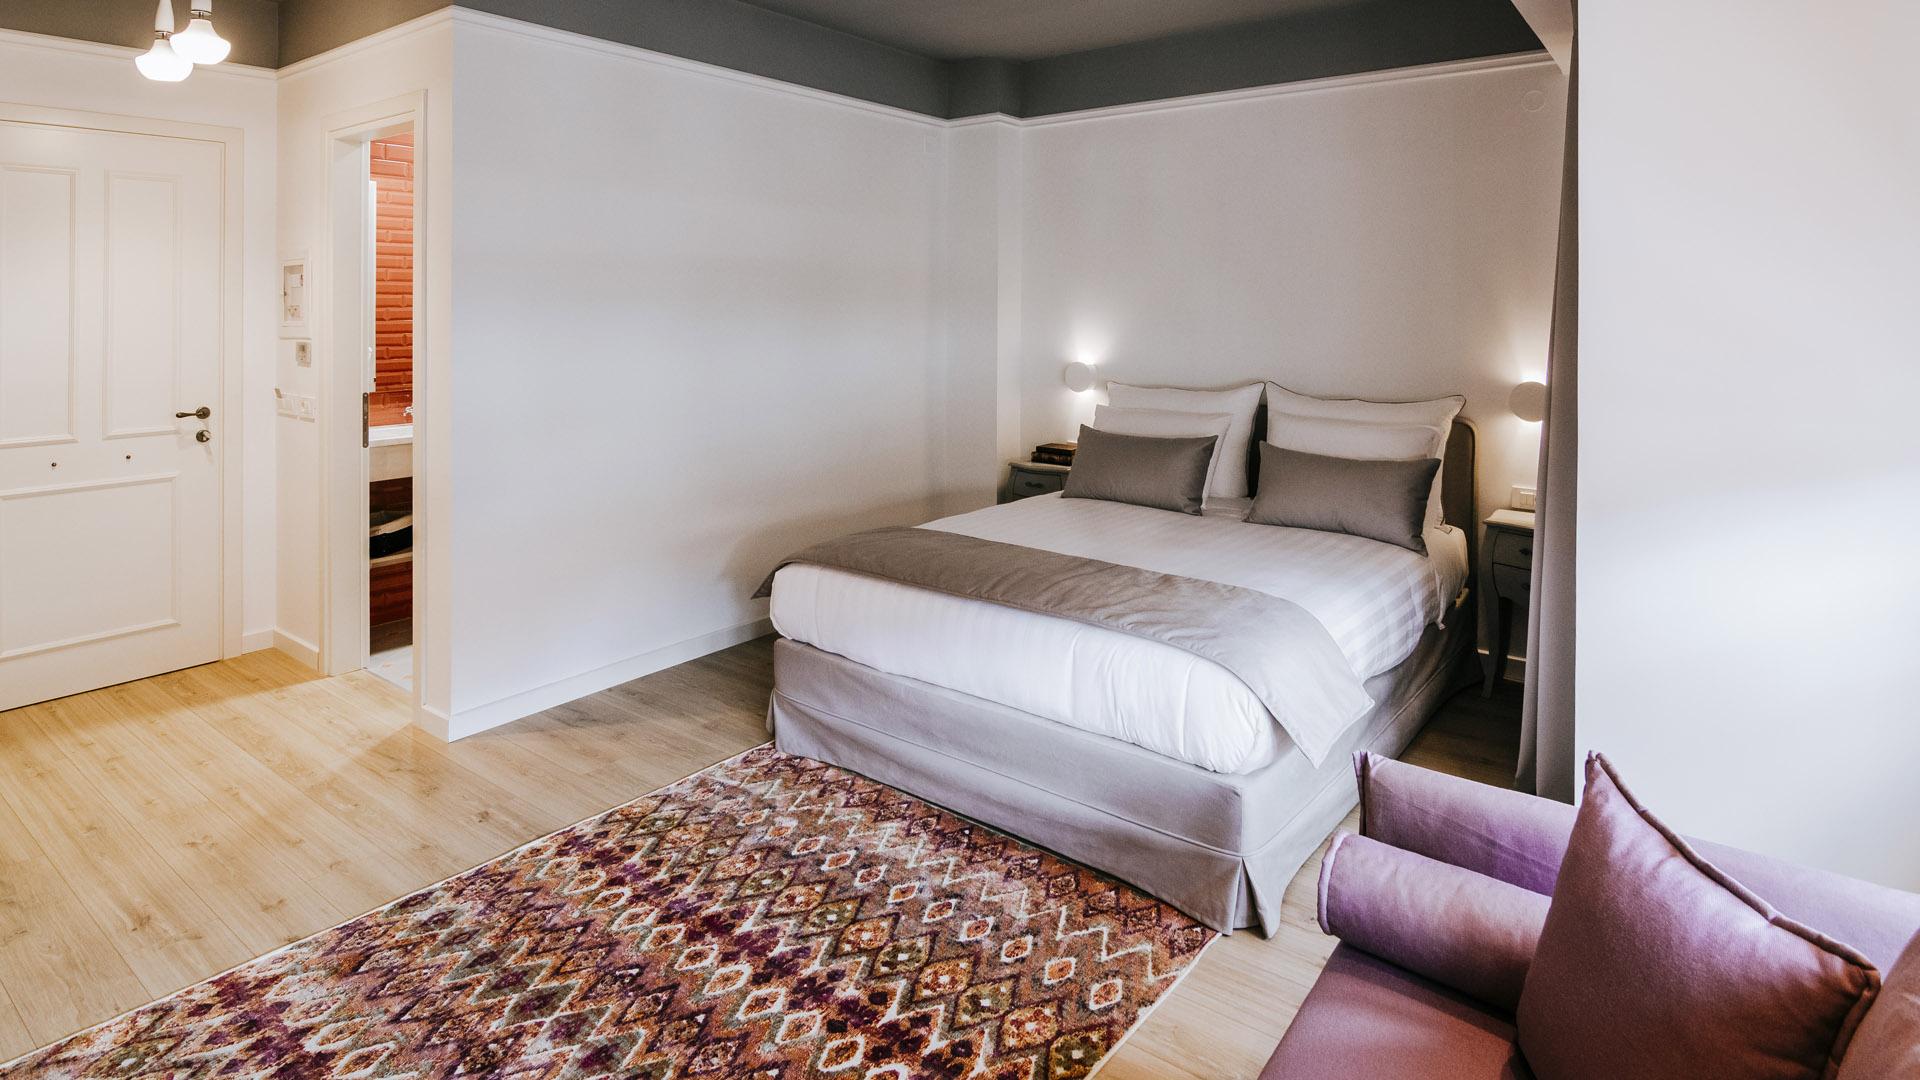 http://itskale-hotel.gr/demo/wp-content/uploads/2013/10/DSC_5932.jpg